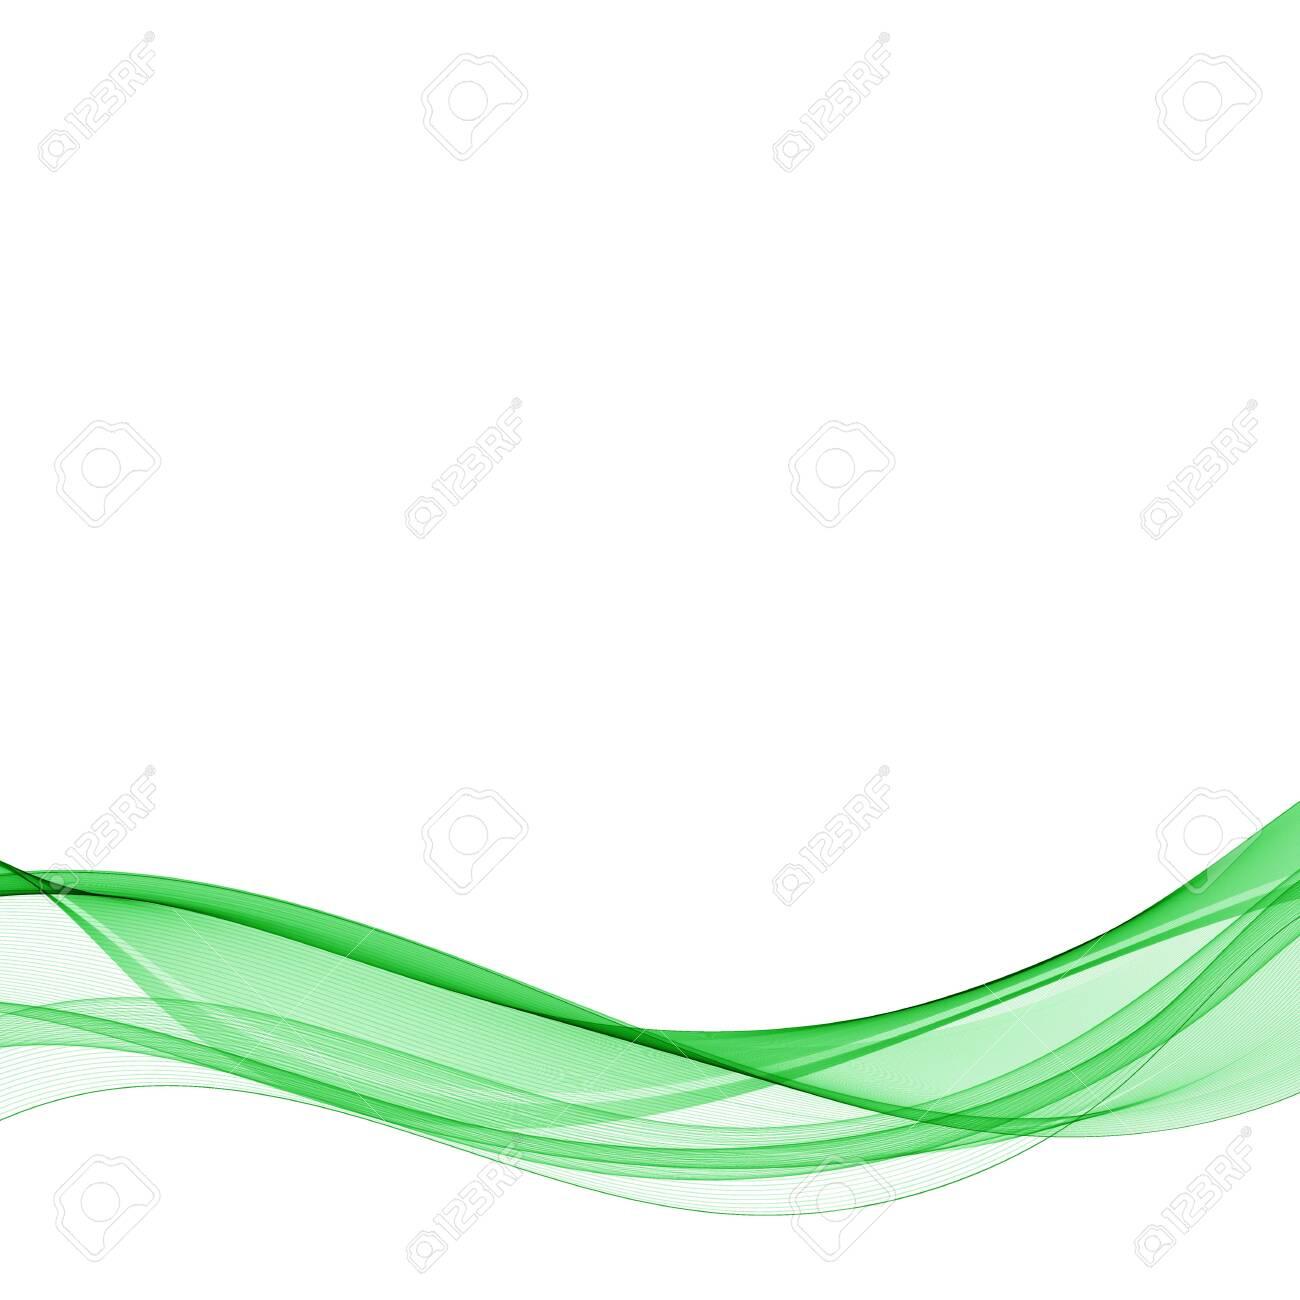 Abstract vector background, green waved lines for brochure, website, flyer design. Transparent smooth wave. - 152297601